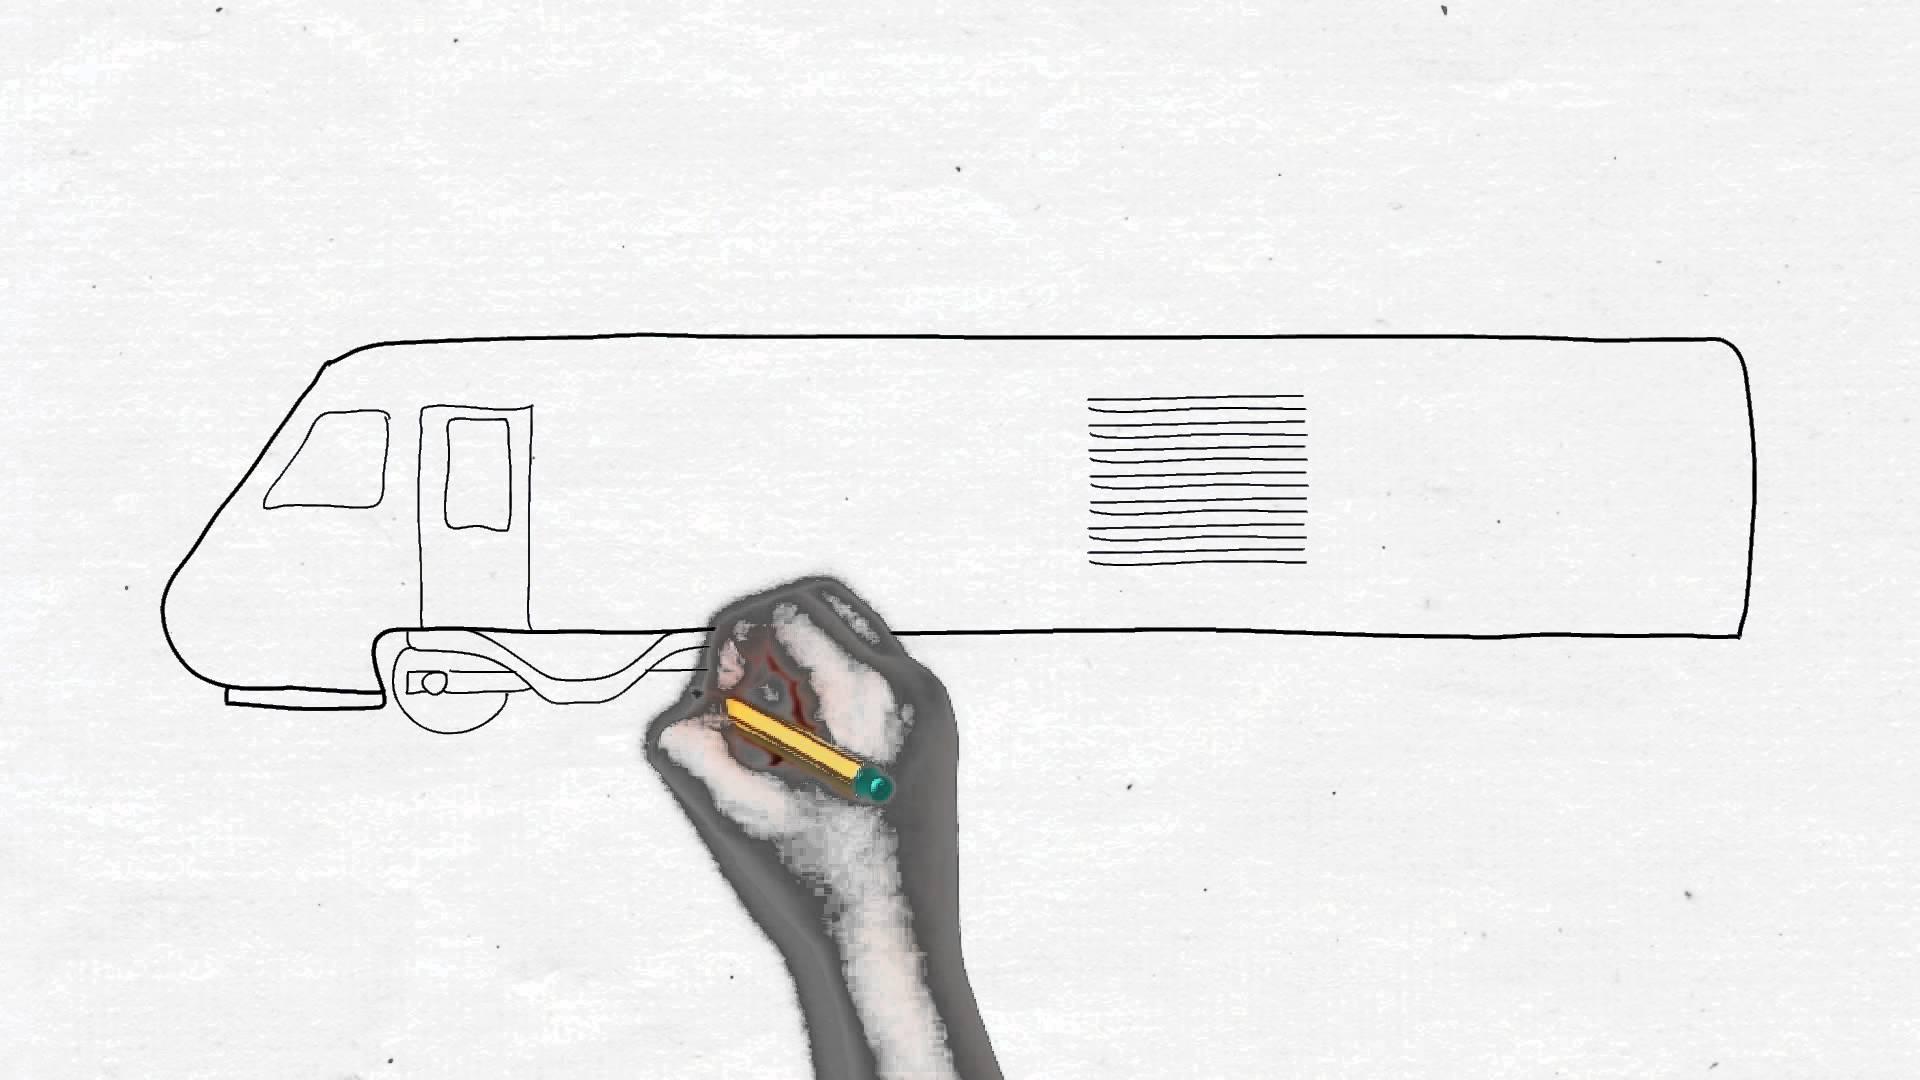 Drawn railroad bullat  drawing kids Drawing bullet